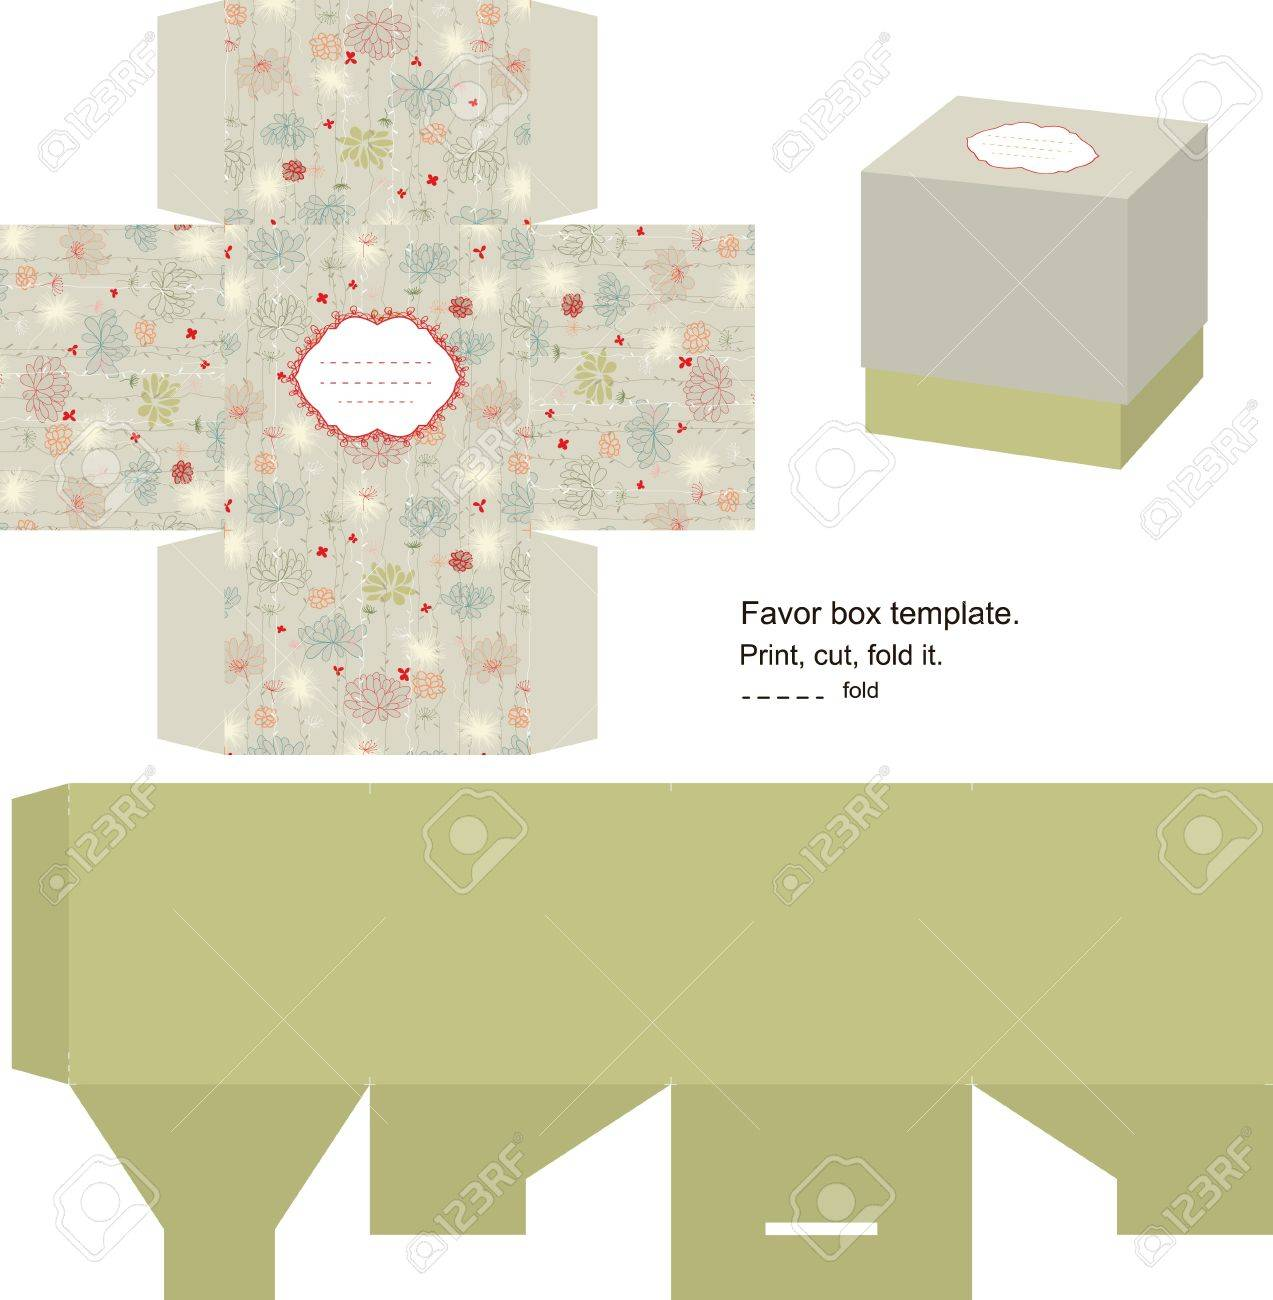 favor box die cut floral pattern empty label royalty free